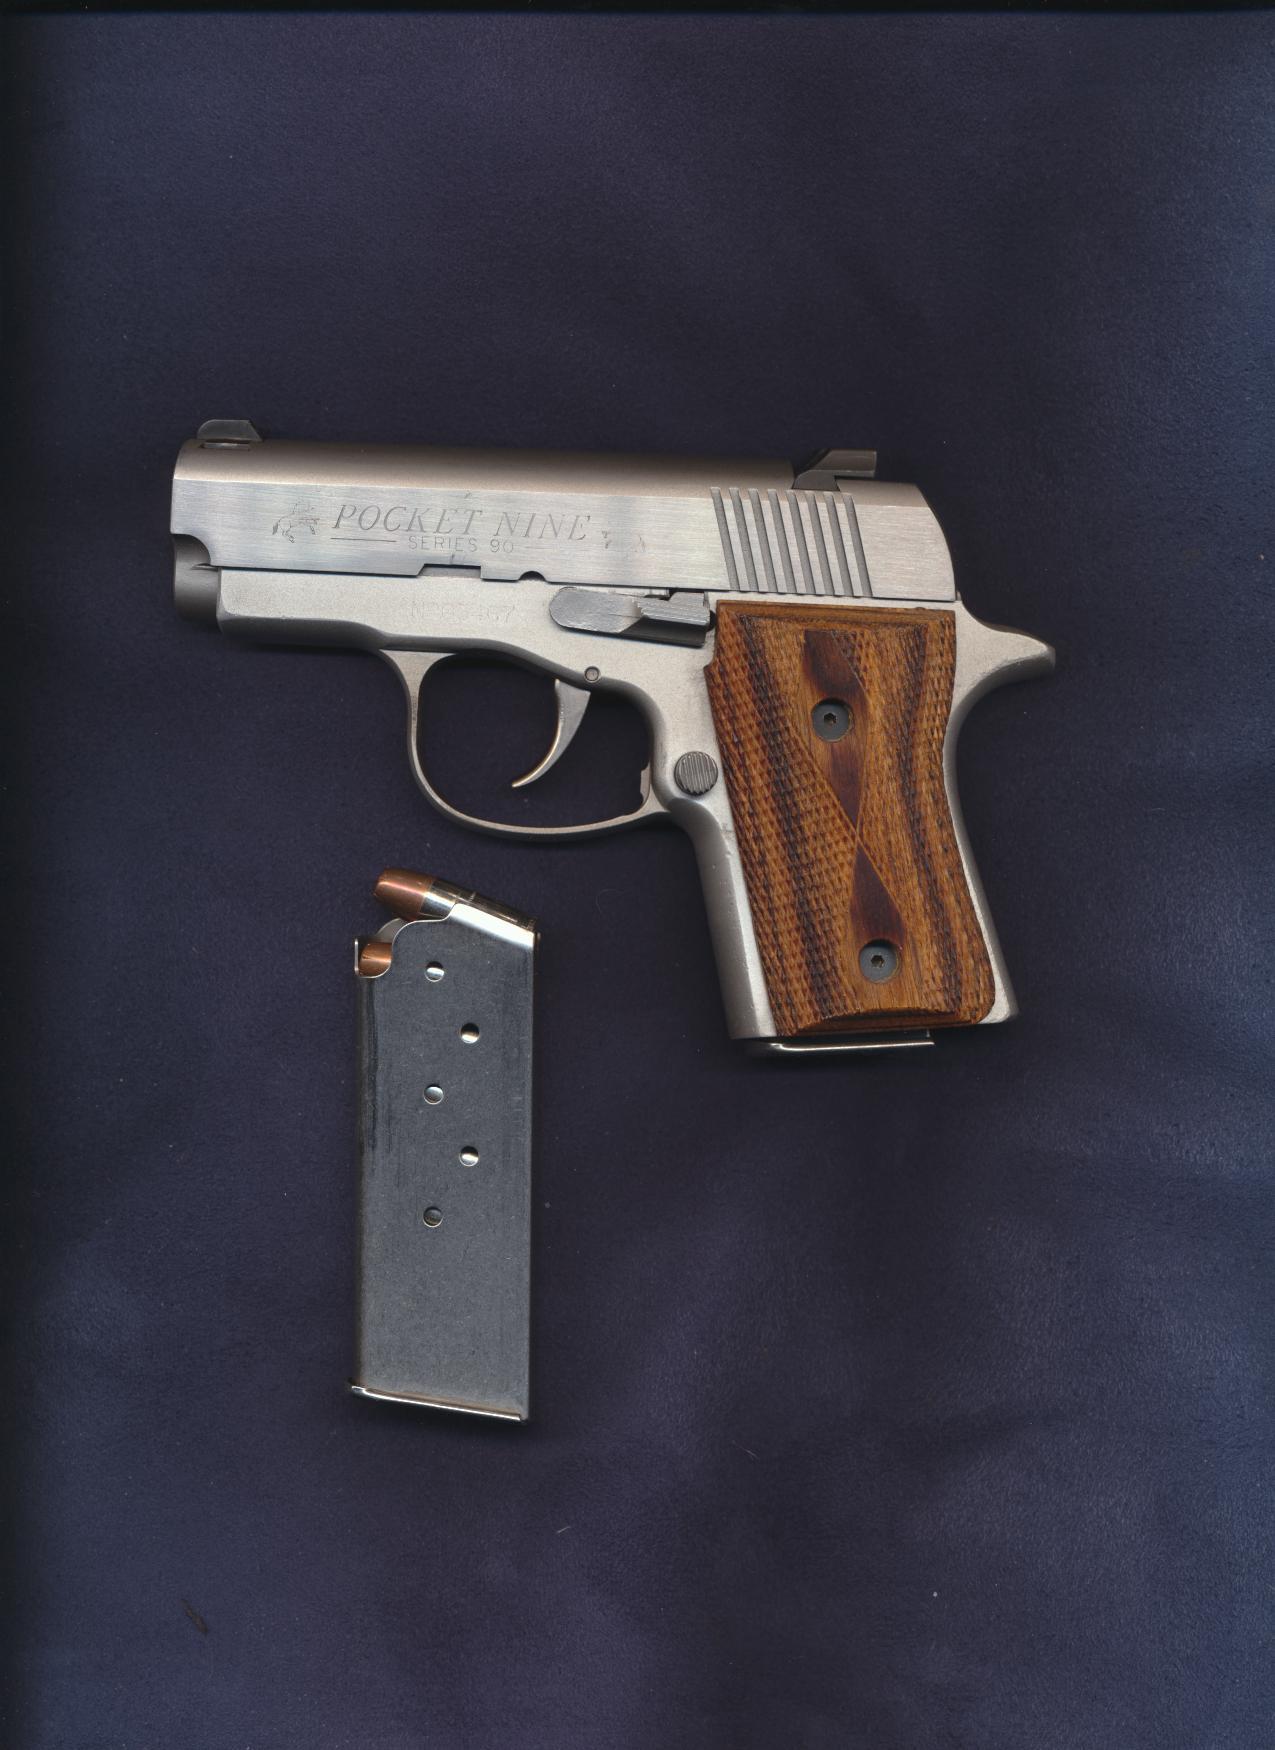 New grips for my Colt Pocket Nine-pocket-9-grips-001.jpg